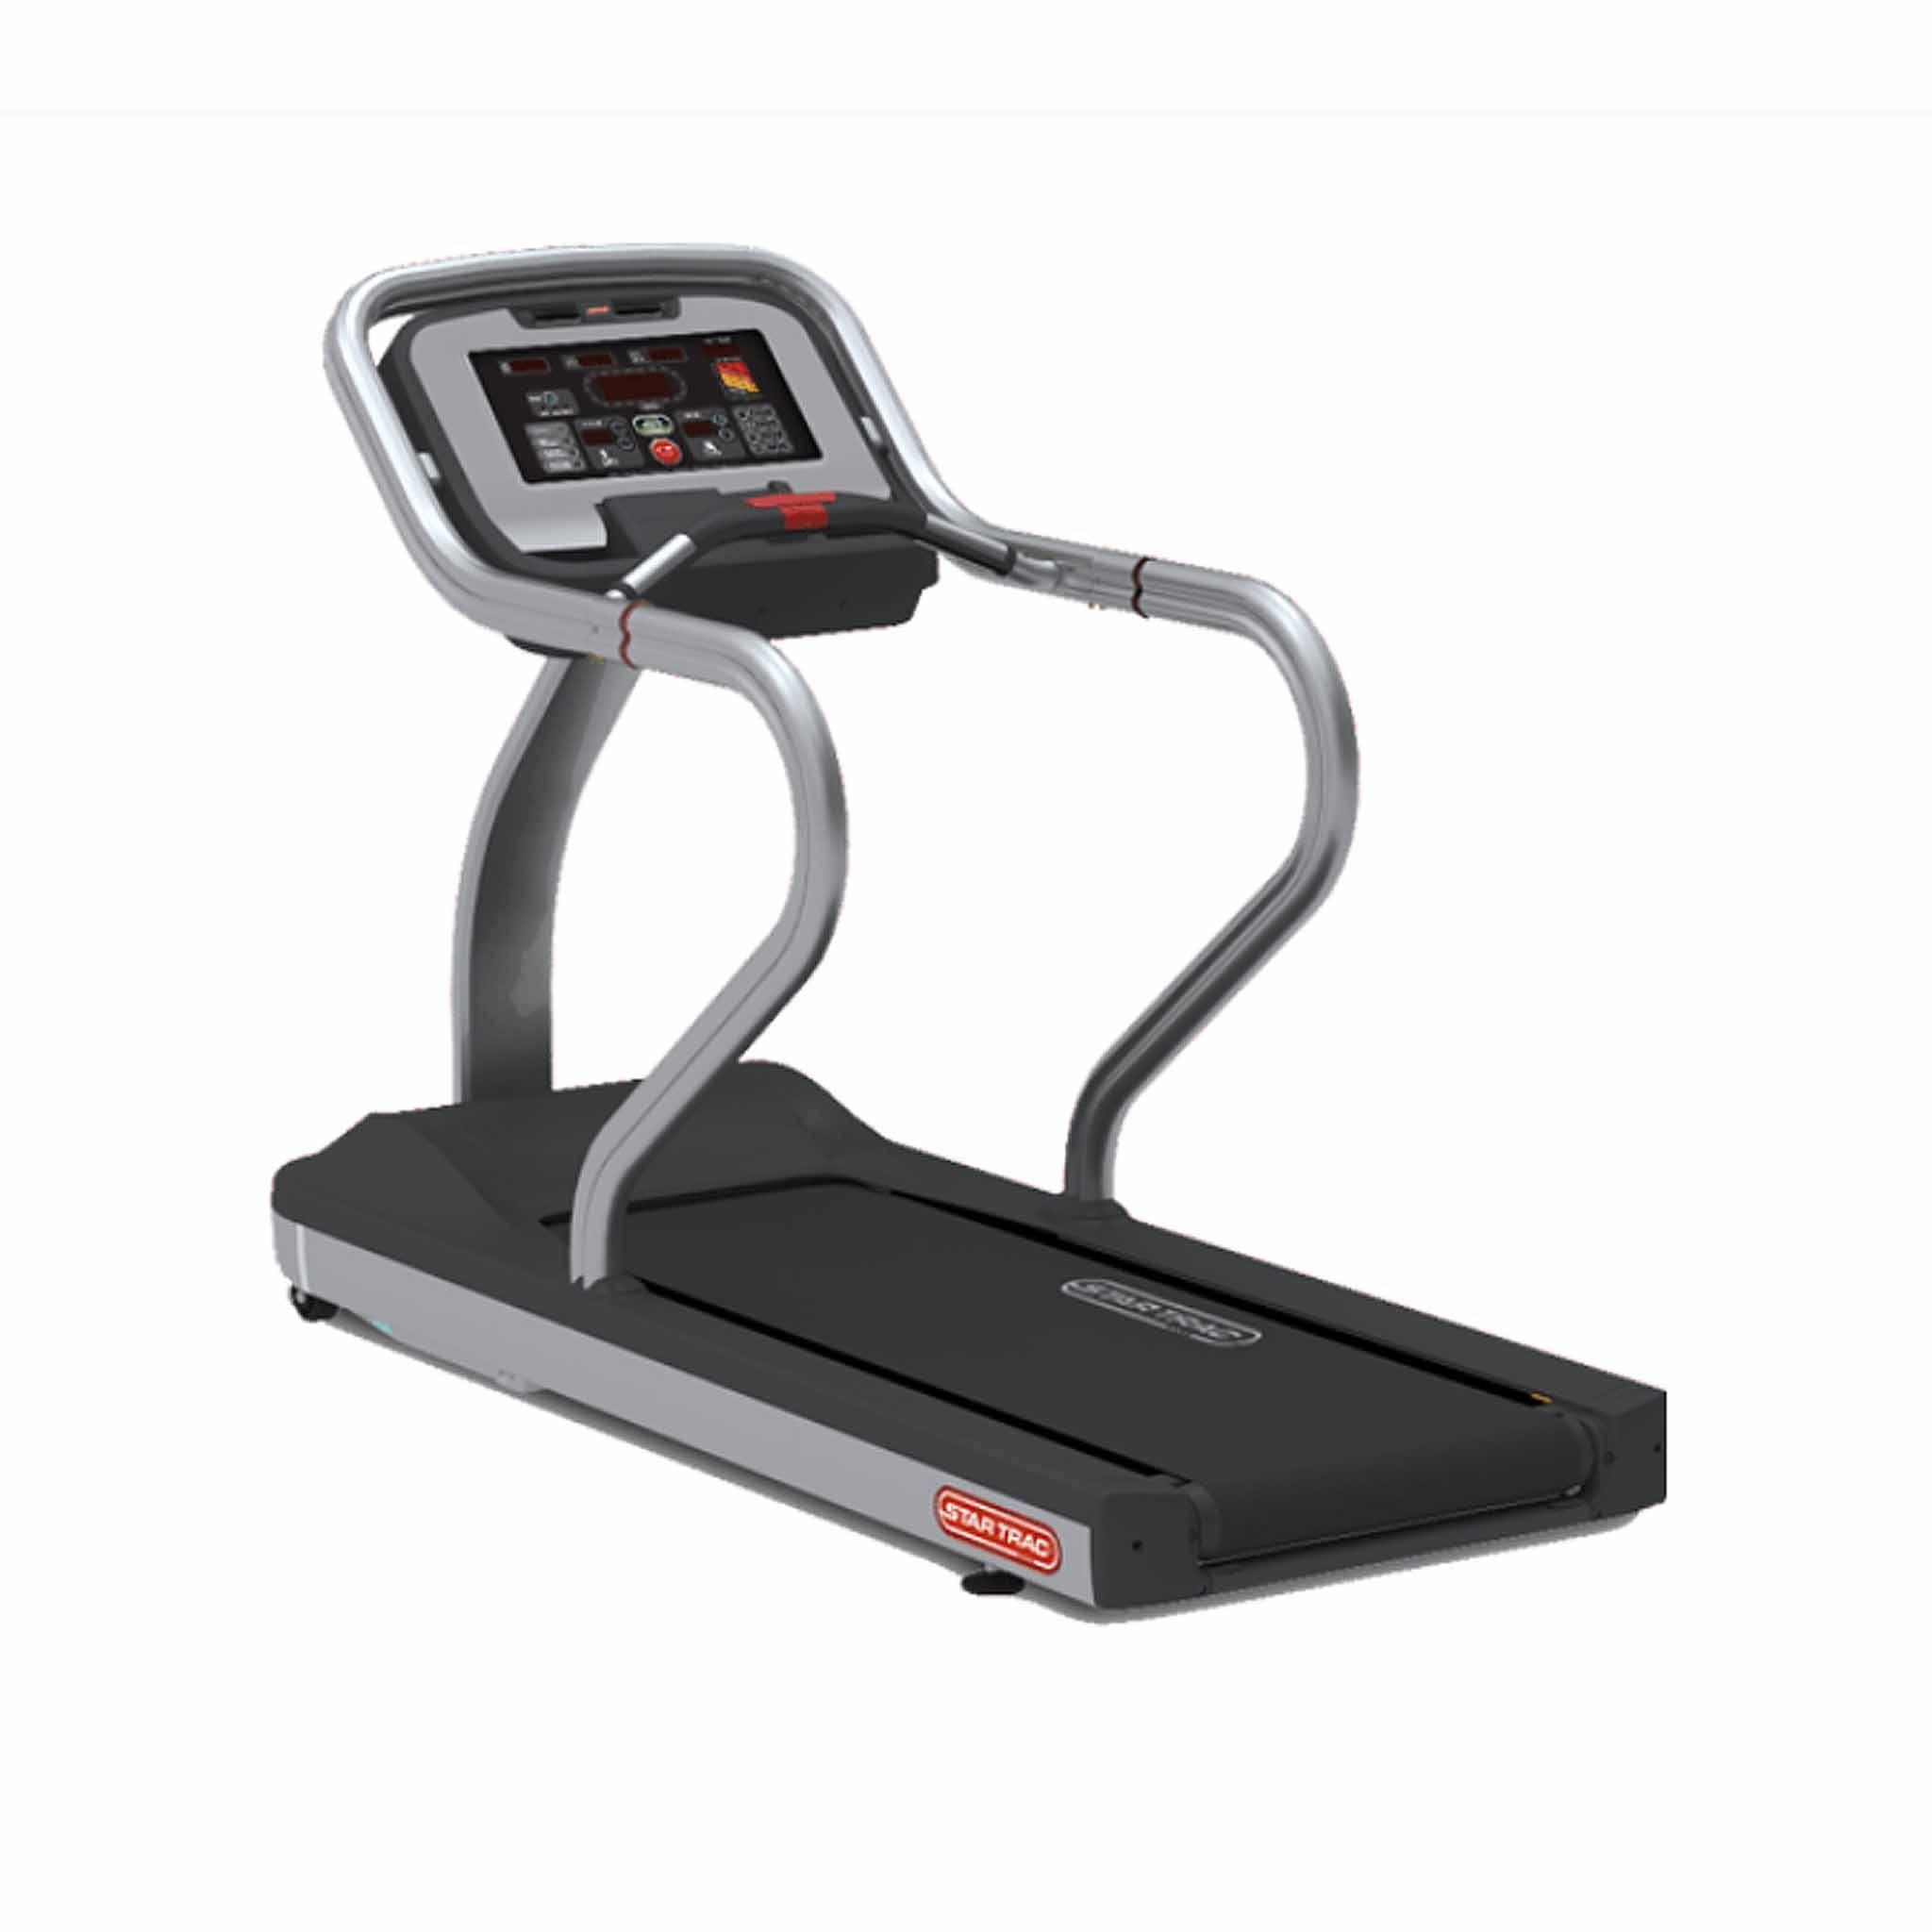 Vancouver Treadmills - Lifestyle Equipment